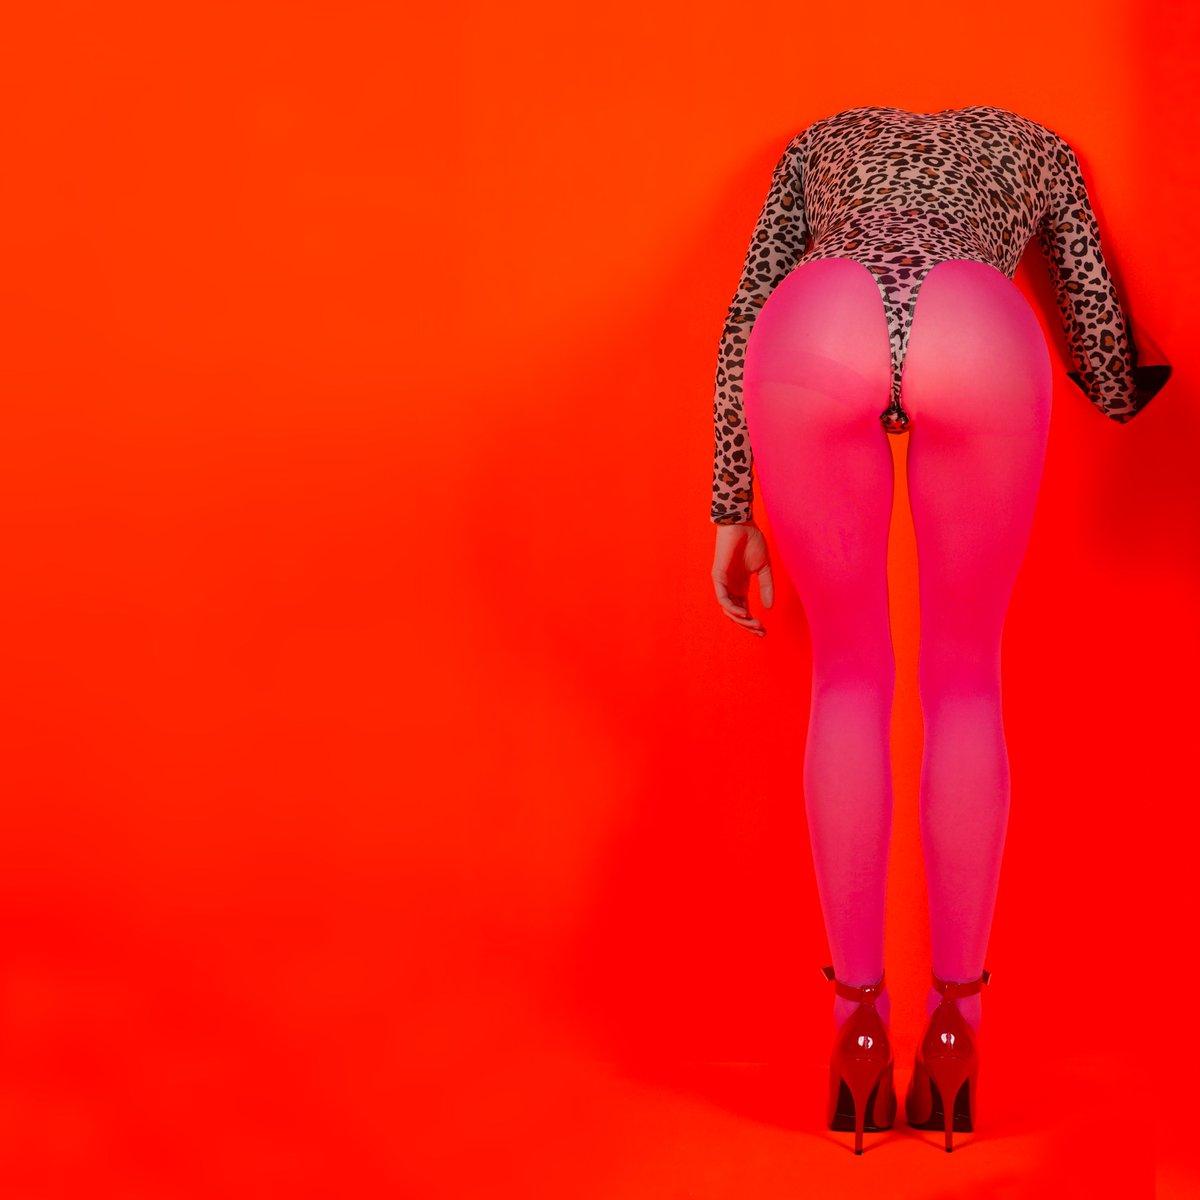 St. Vincent / Annie Clark [Esperando al nuevo disco] DJCt17VUMAAhnBR